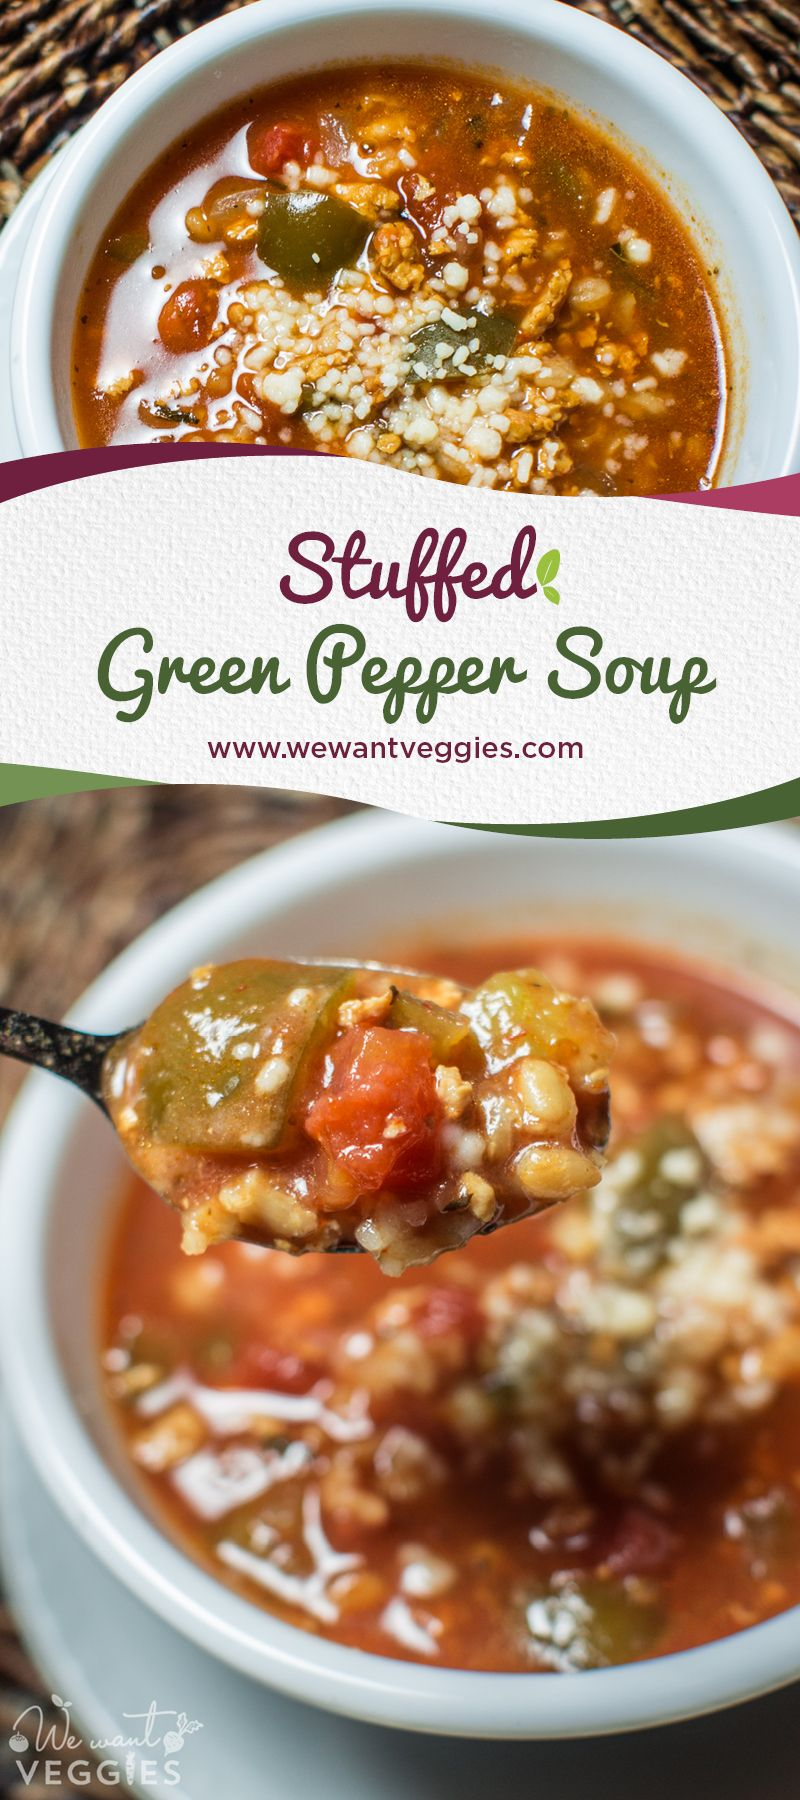 Stuffed Green Pepper Soup An Easy Recipe For Your Slow Cooker Recipe Stuffed Peppers Green Pepper Soup Stuffed Green Peppers